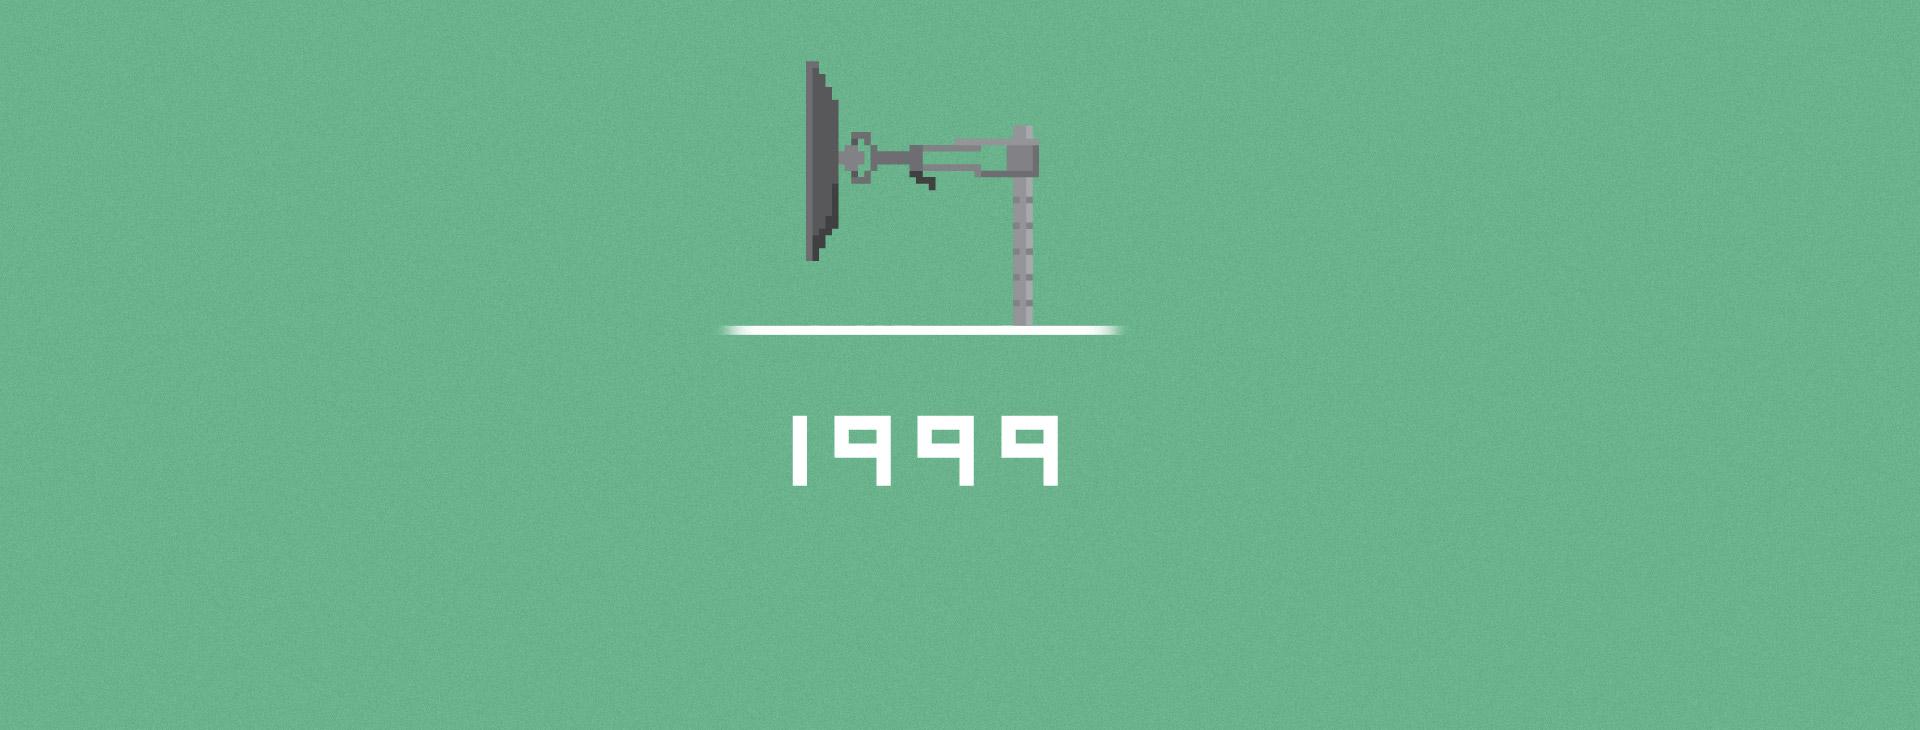 Pixel_Wishbone_1999